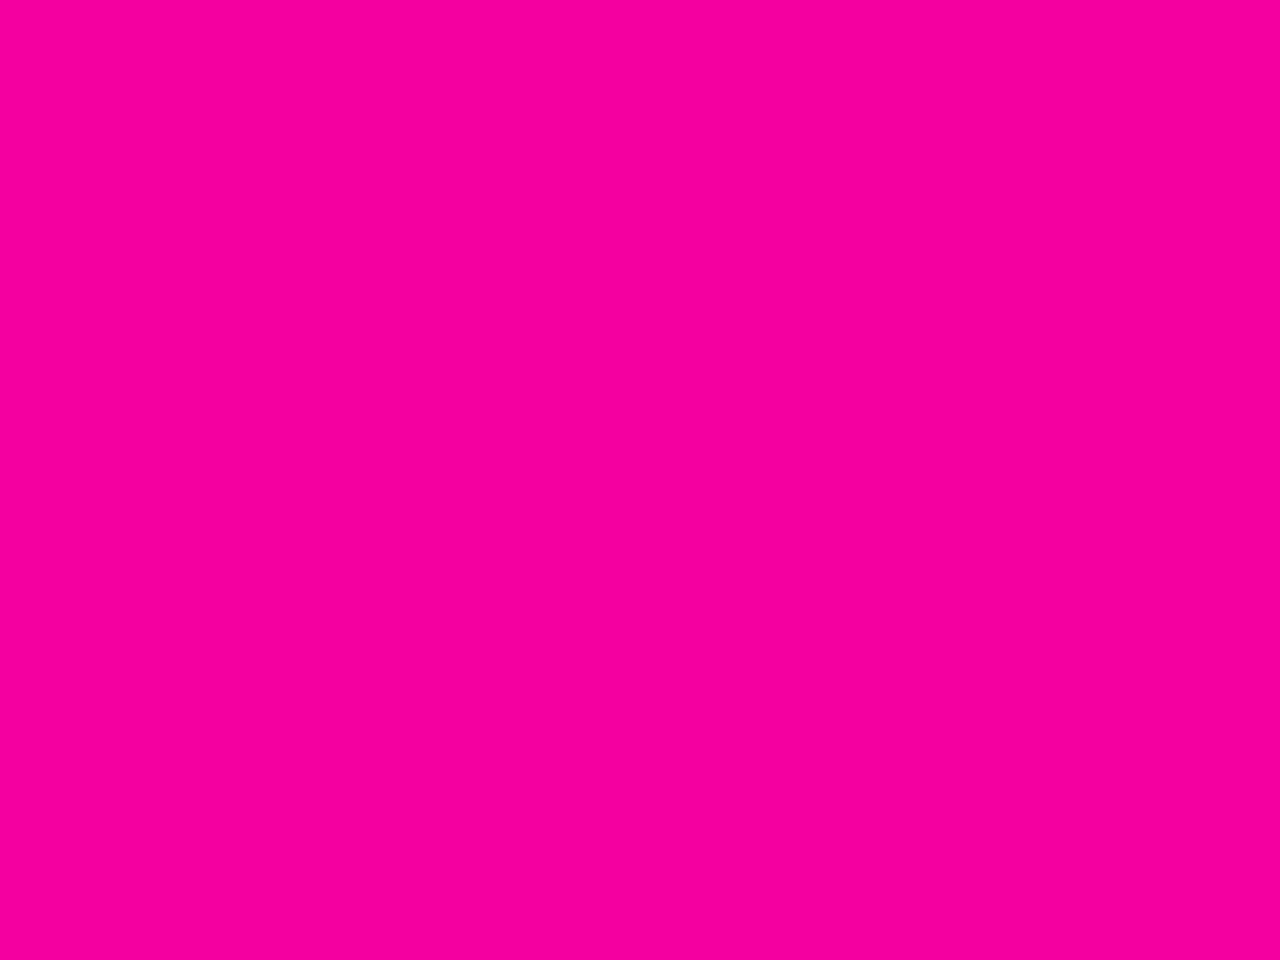 1280x960 Fashion Fuchsia Solid Color Background